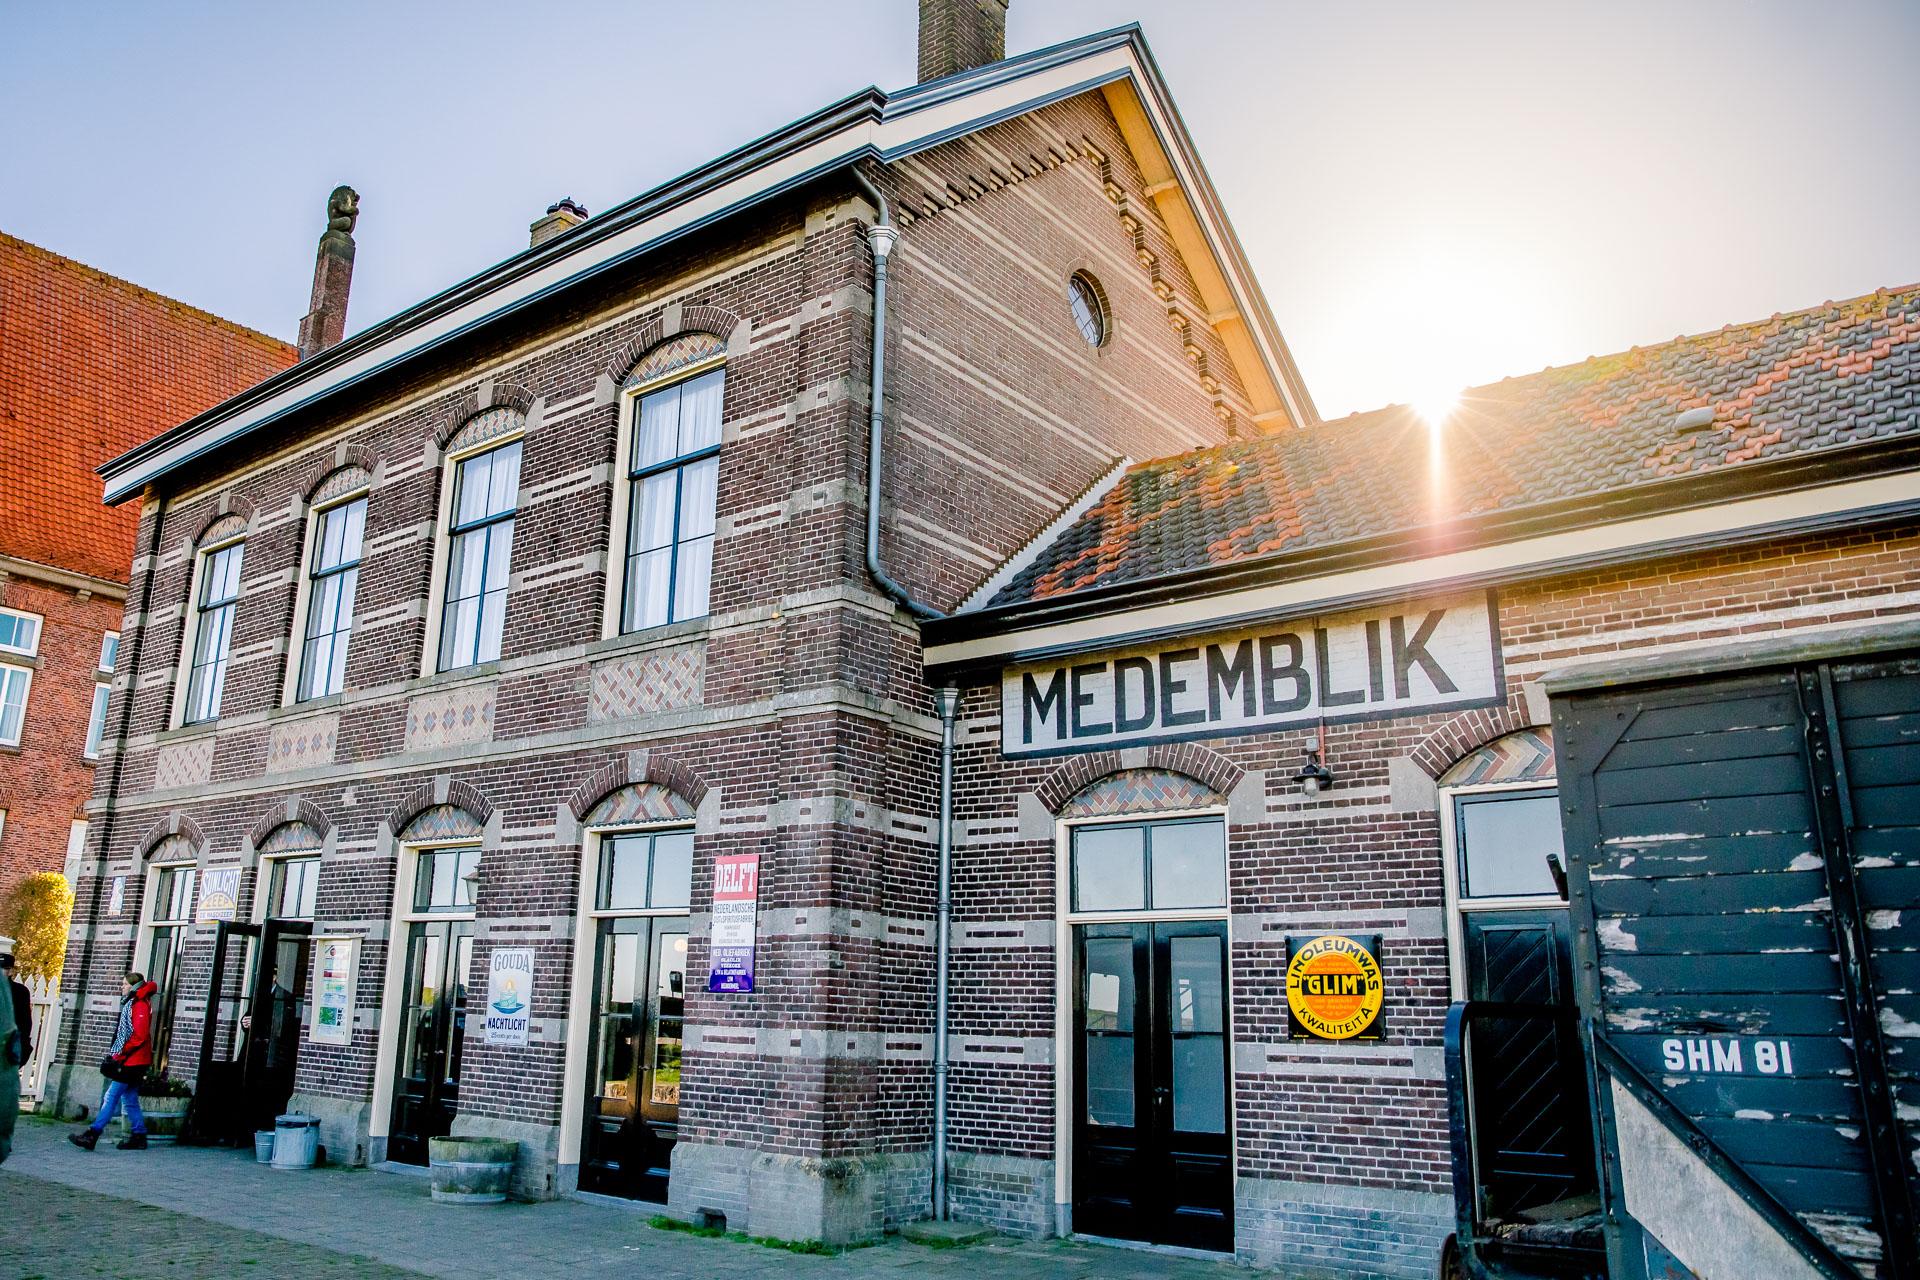 Er op uit in Medemblik West-Friesland